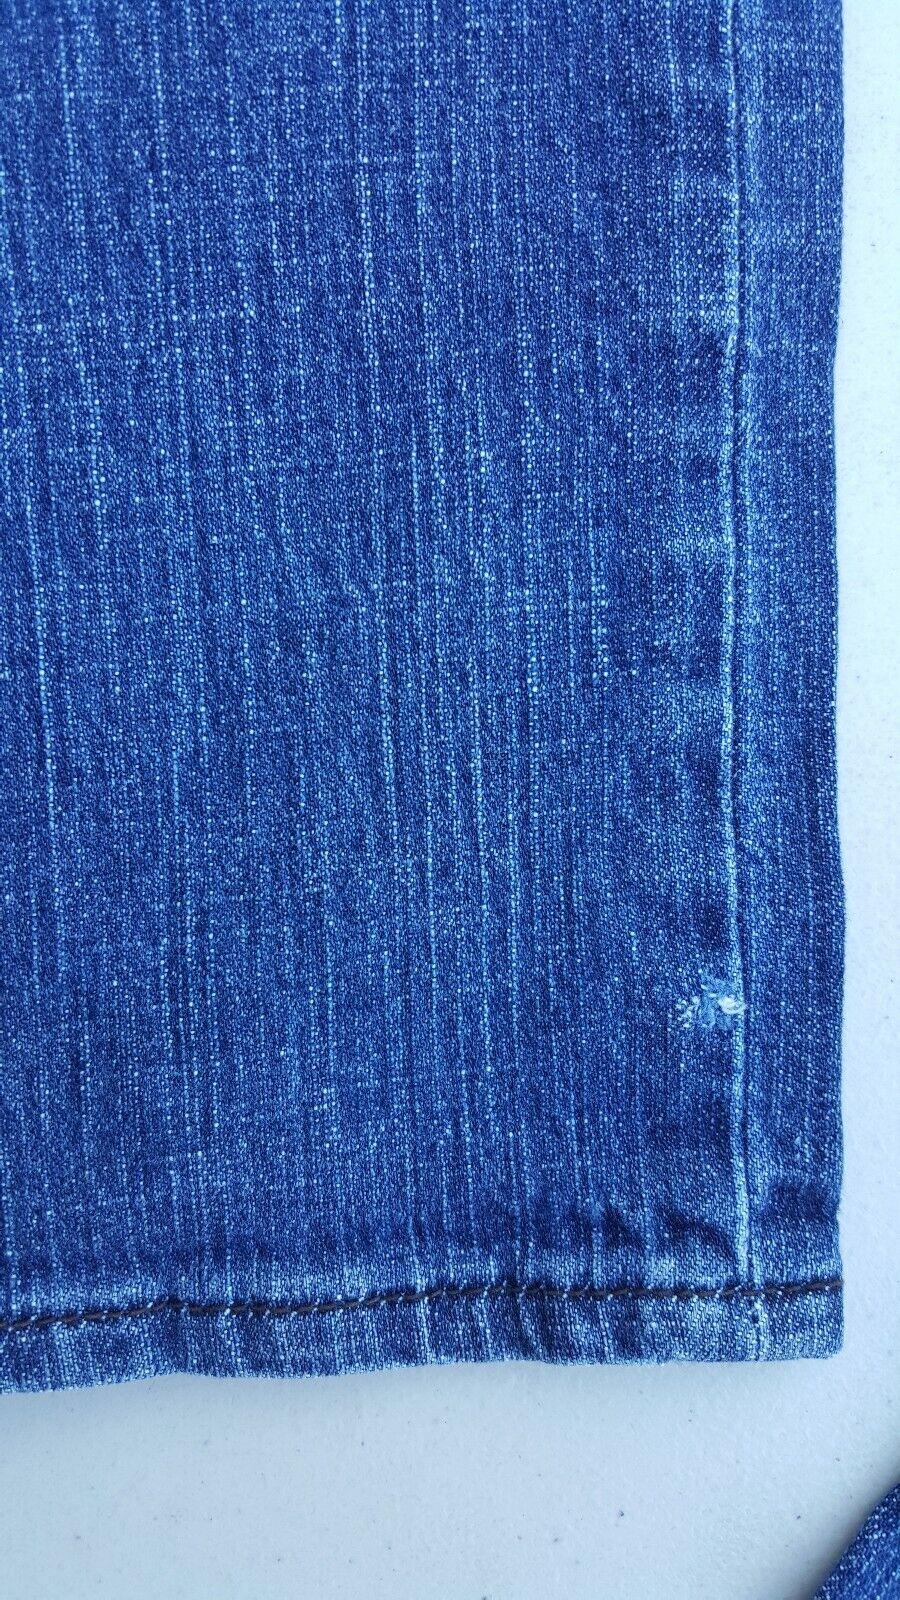 Women s / Junior / Ladies VOLCOM Jeans Low Waist Straight Leg Tag Sz 30 30x29  - $10.95